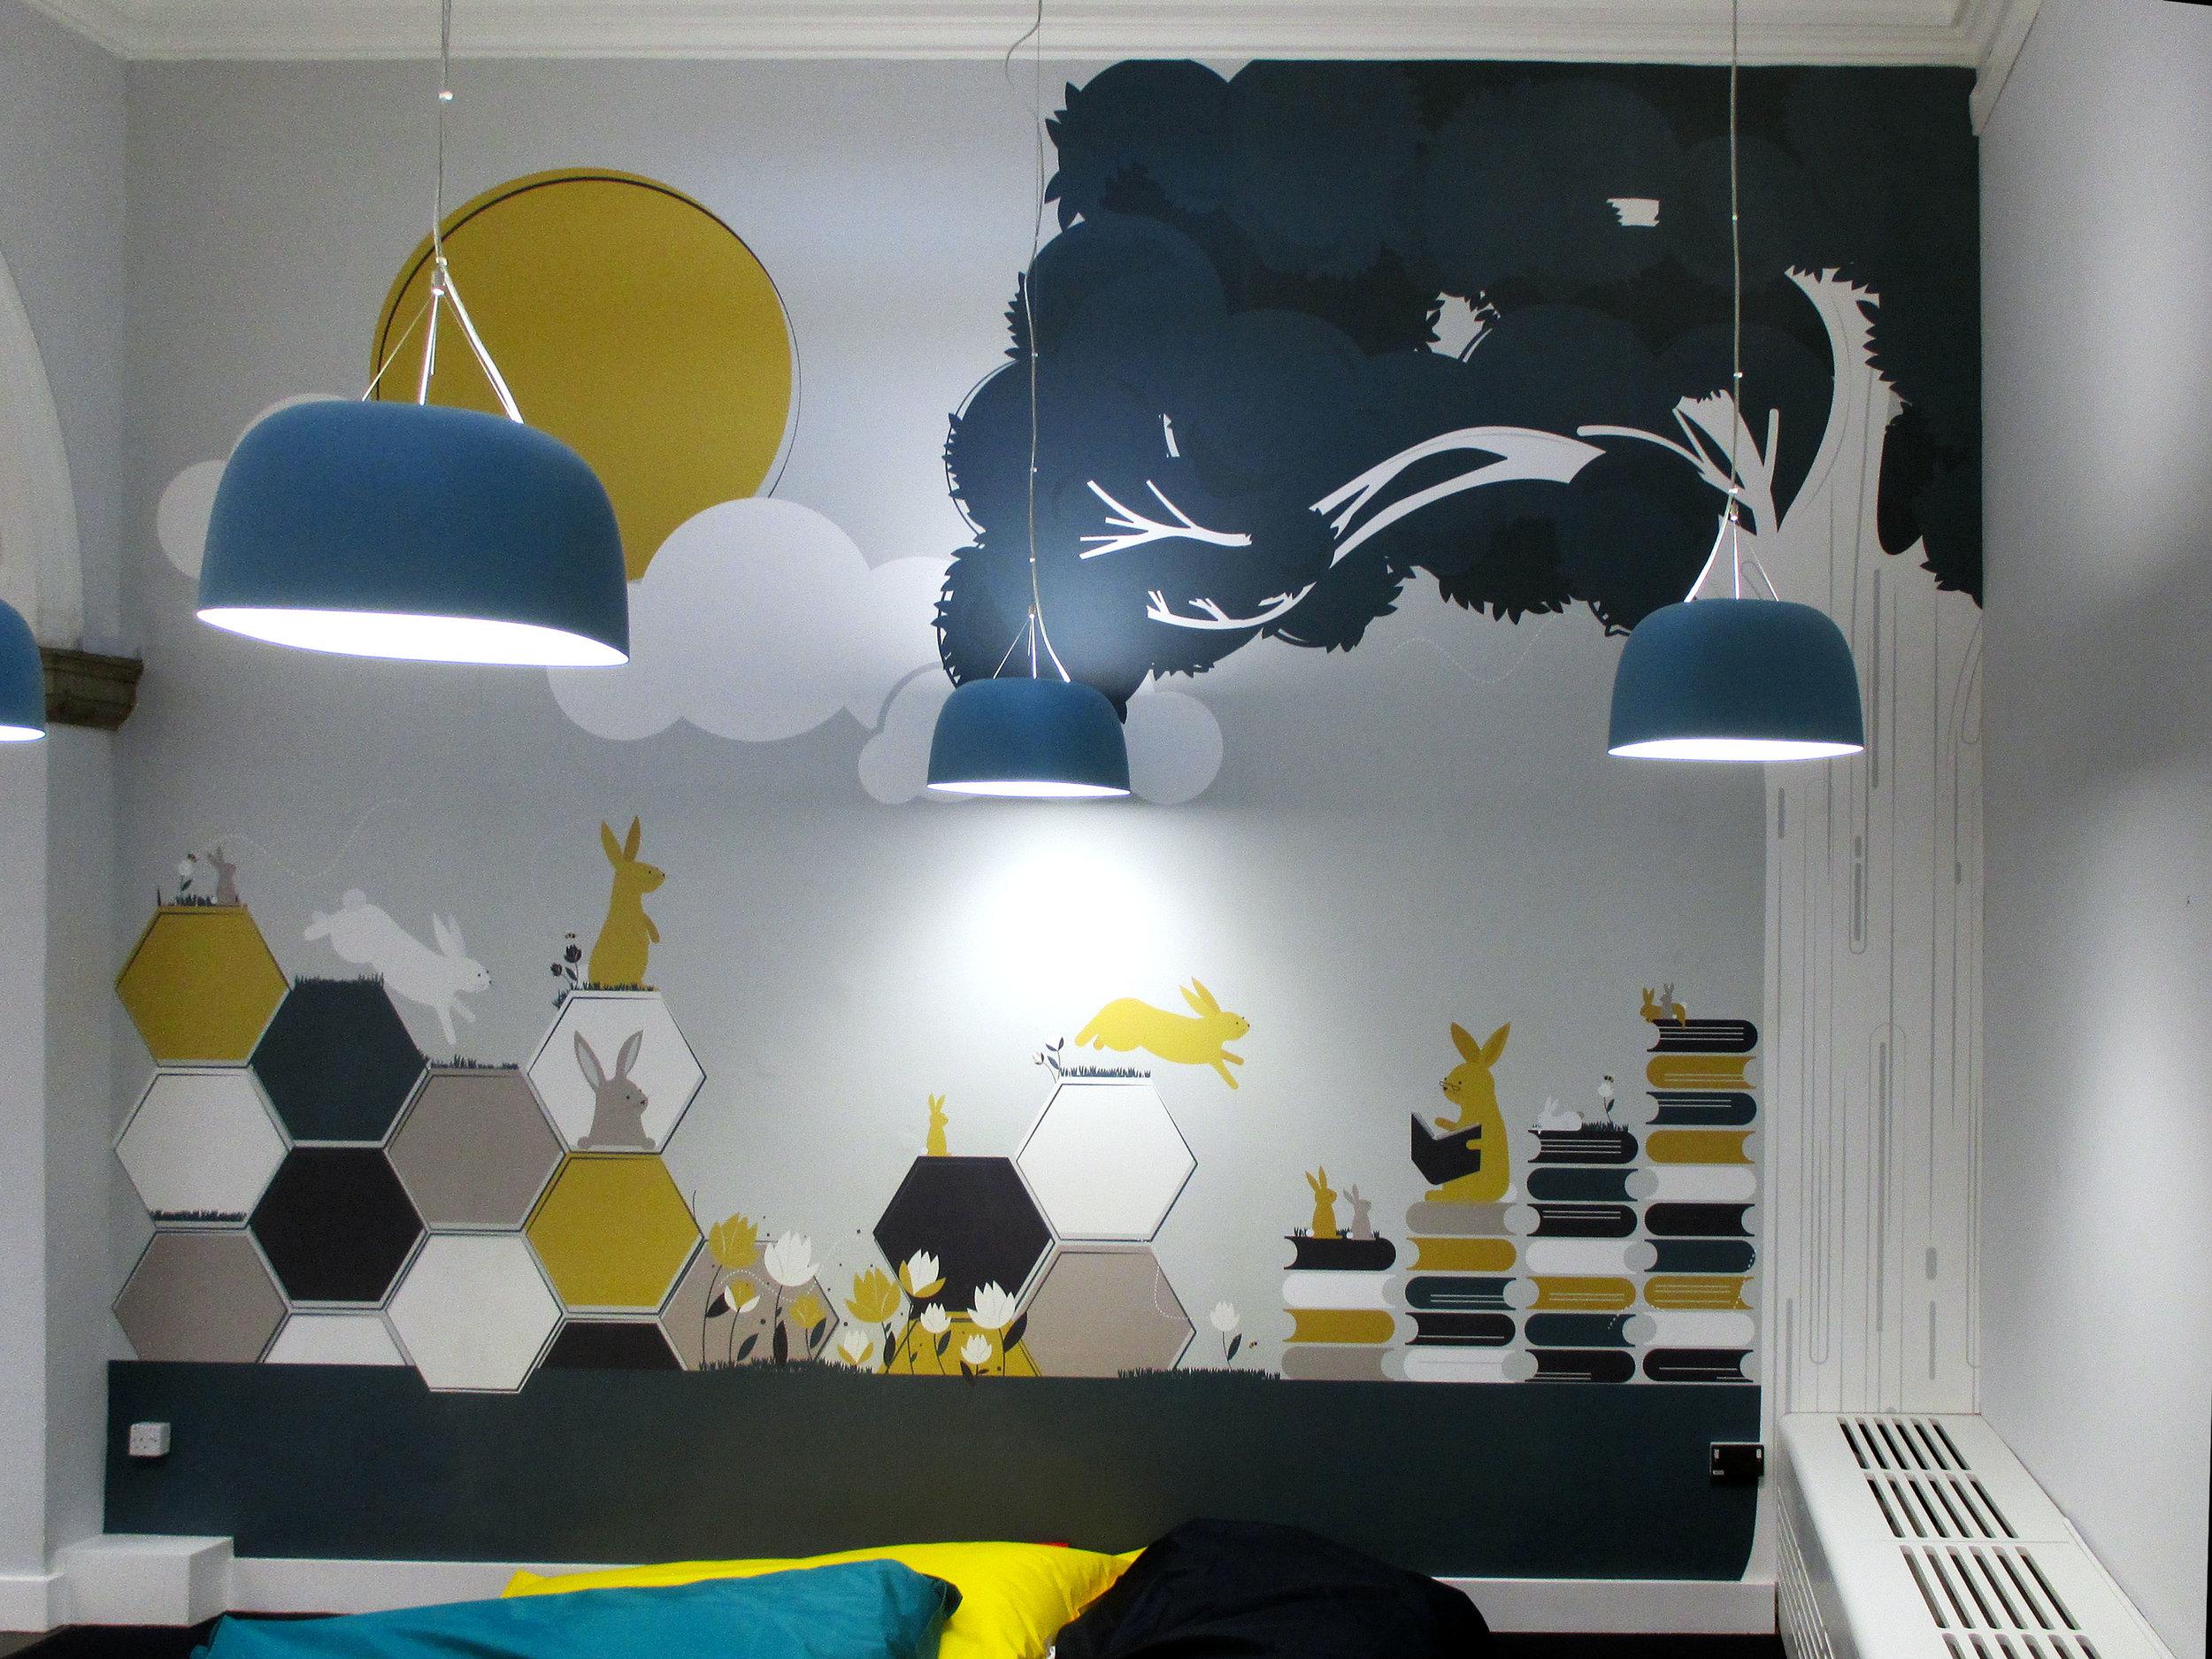 jess-bright-design-cpmg-wall-graphics.JPG